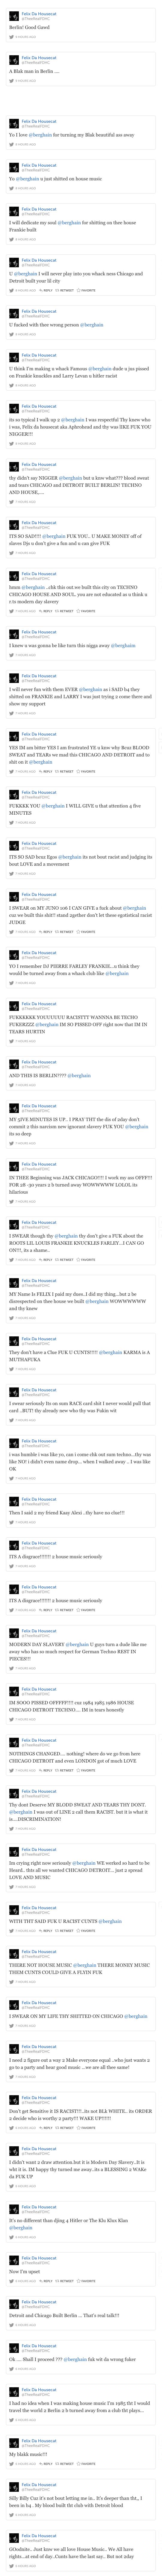 https-storify.com-jcrbcn-felix-da-housecat-rage-against-berghain